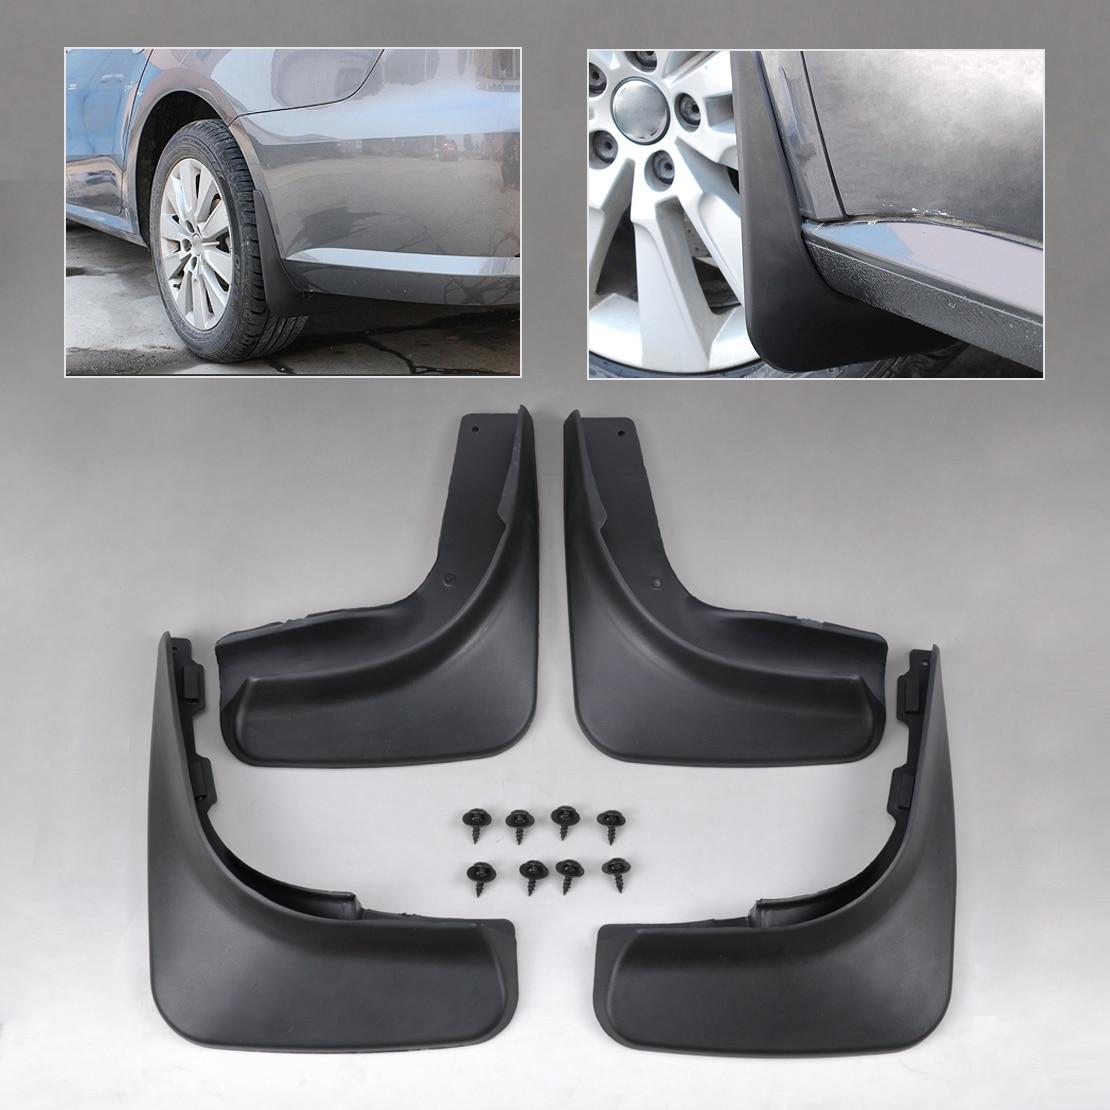 CITALL Black 4Pcs Mud Flap Splash Guards Mudguard ABS Plastic Mudflaps For VW Golf 6 MK6 Hatchback 2009 2010 2011 2012